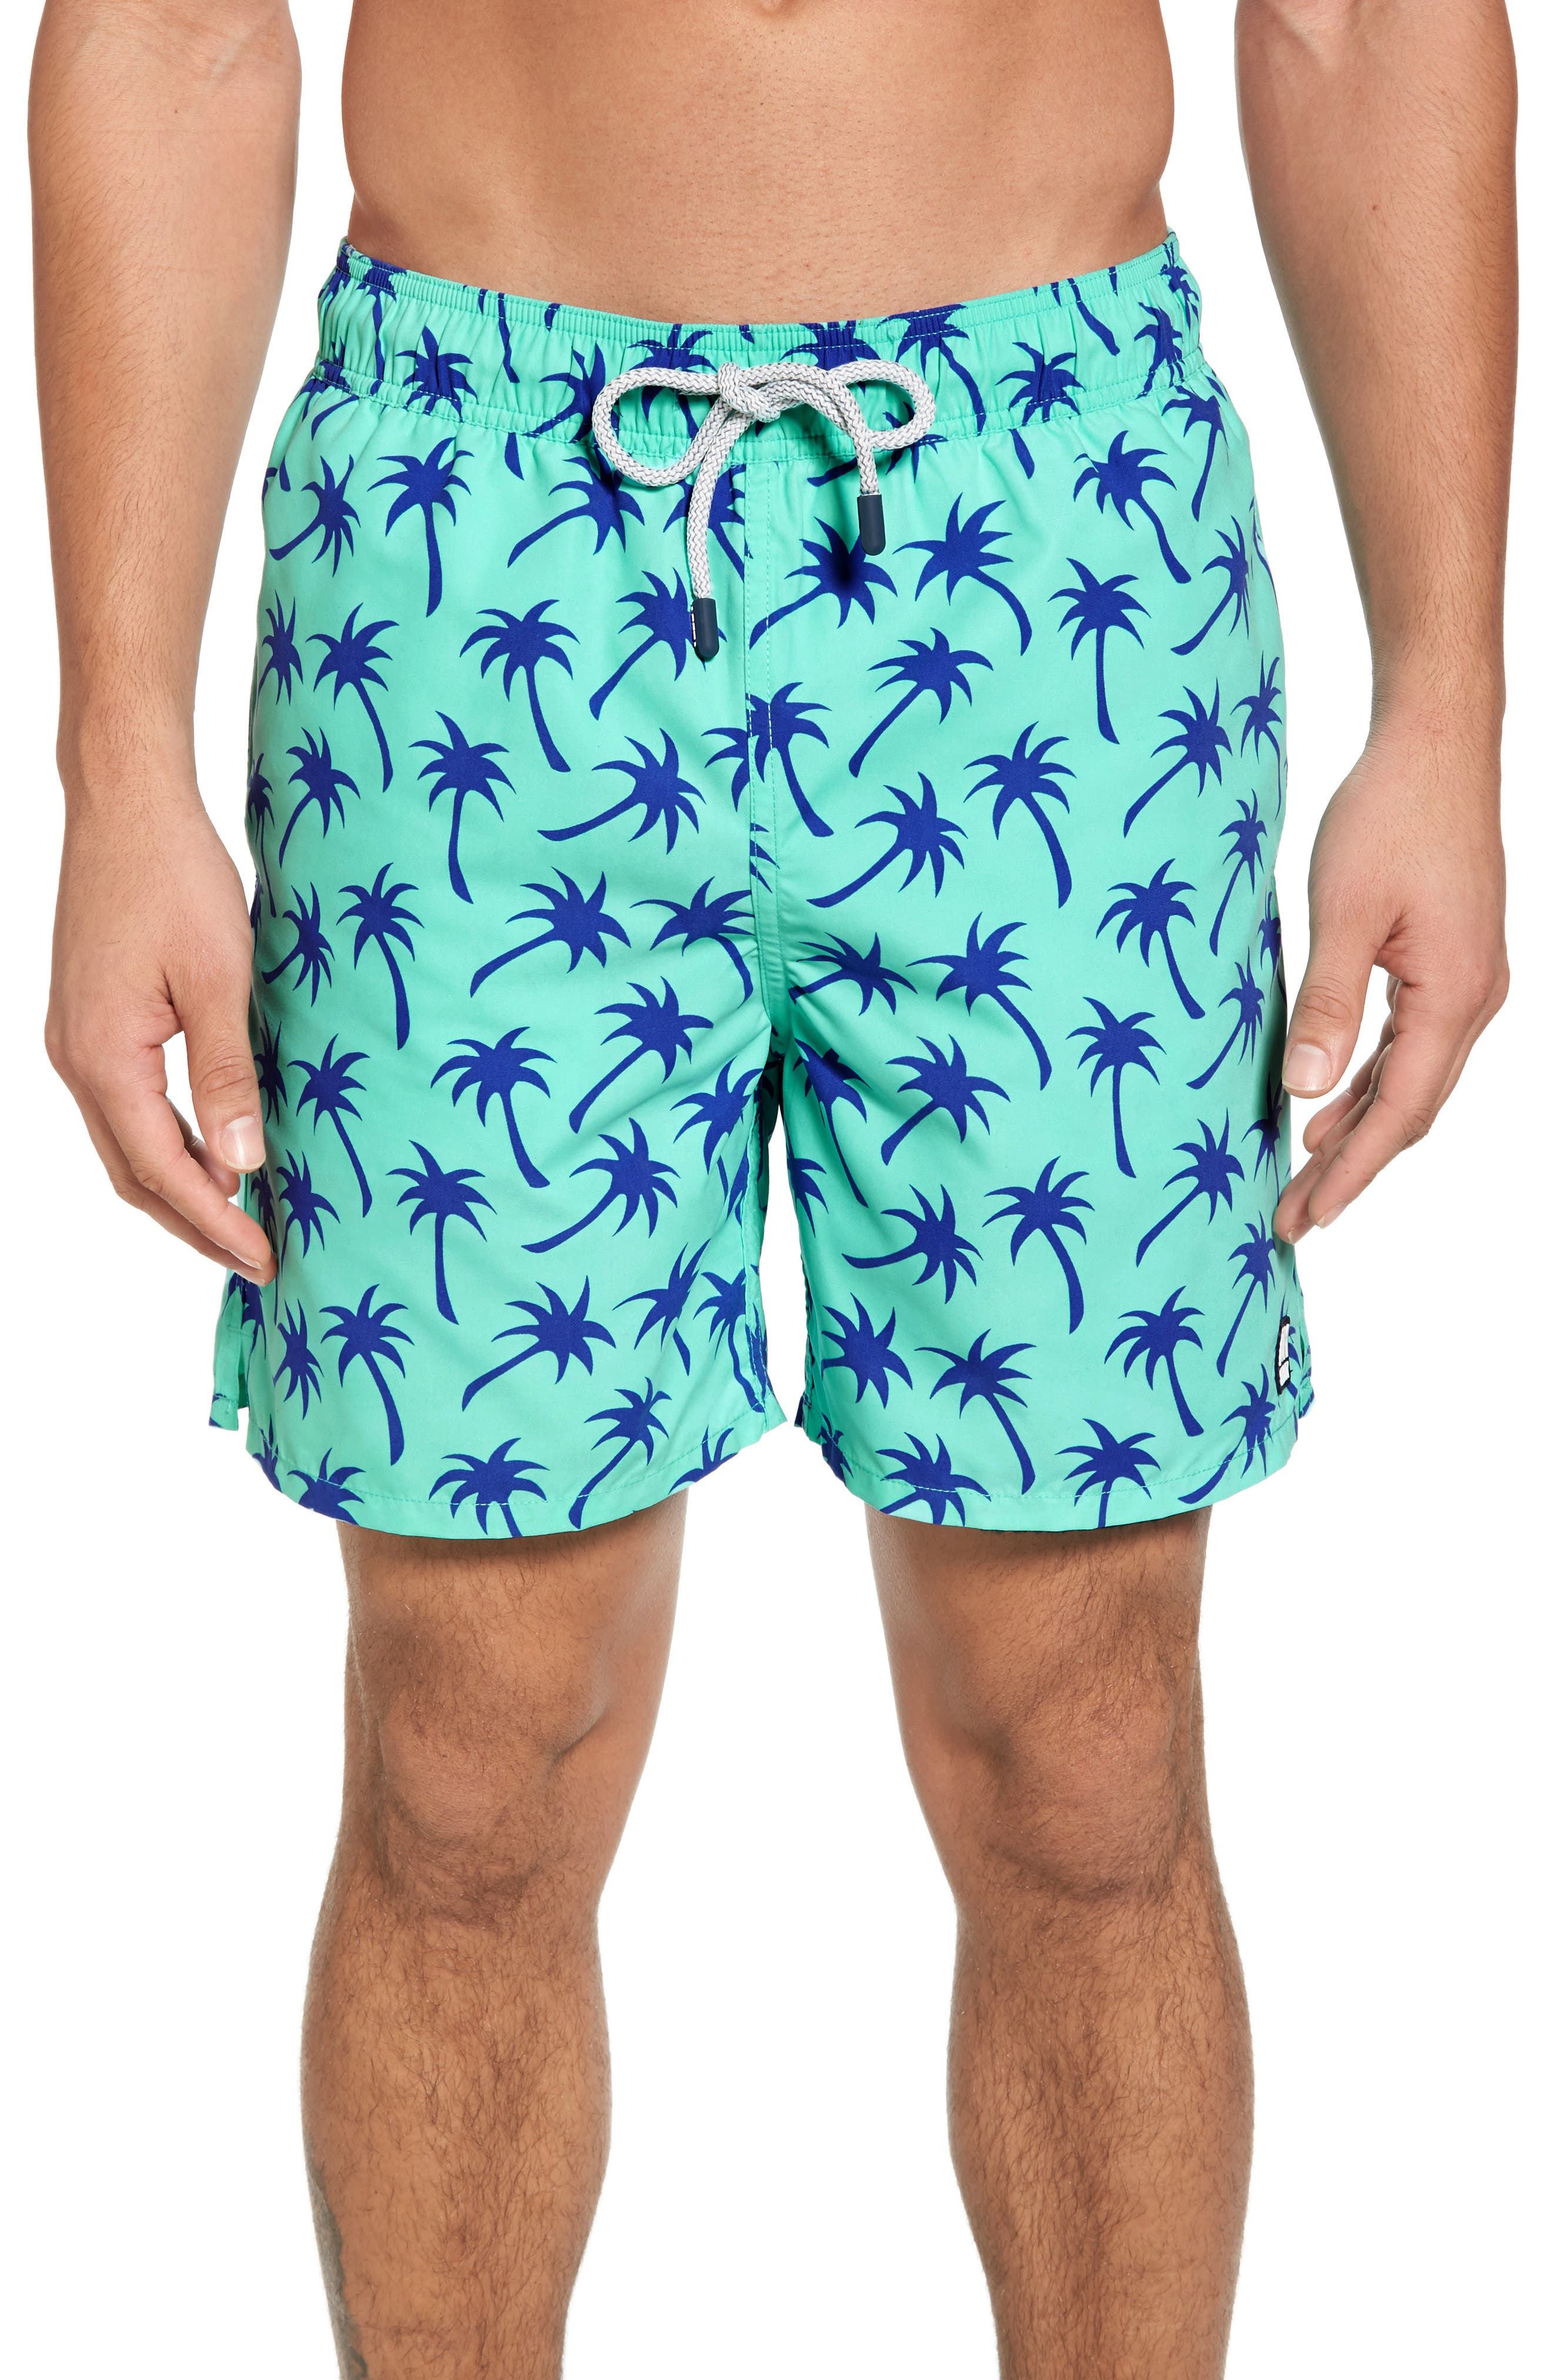 TOM & TEDDY Palm Tree Print Swim Trunks, Main, color, EMERALD/ BLUE